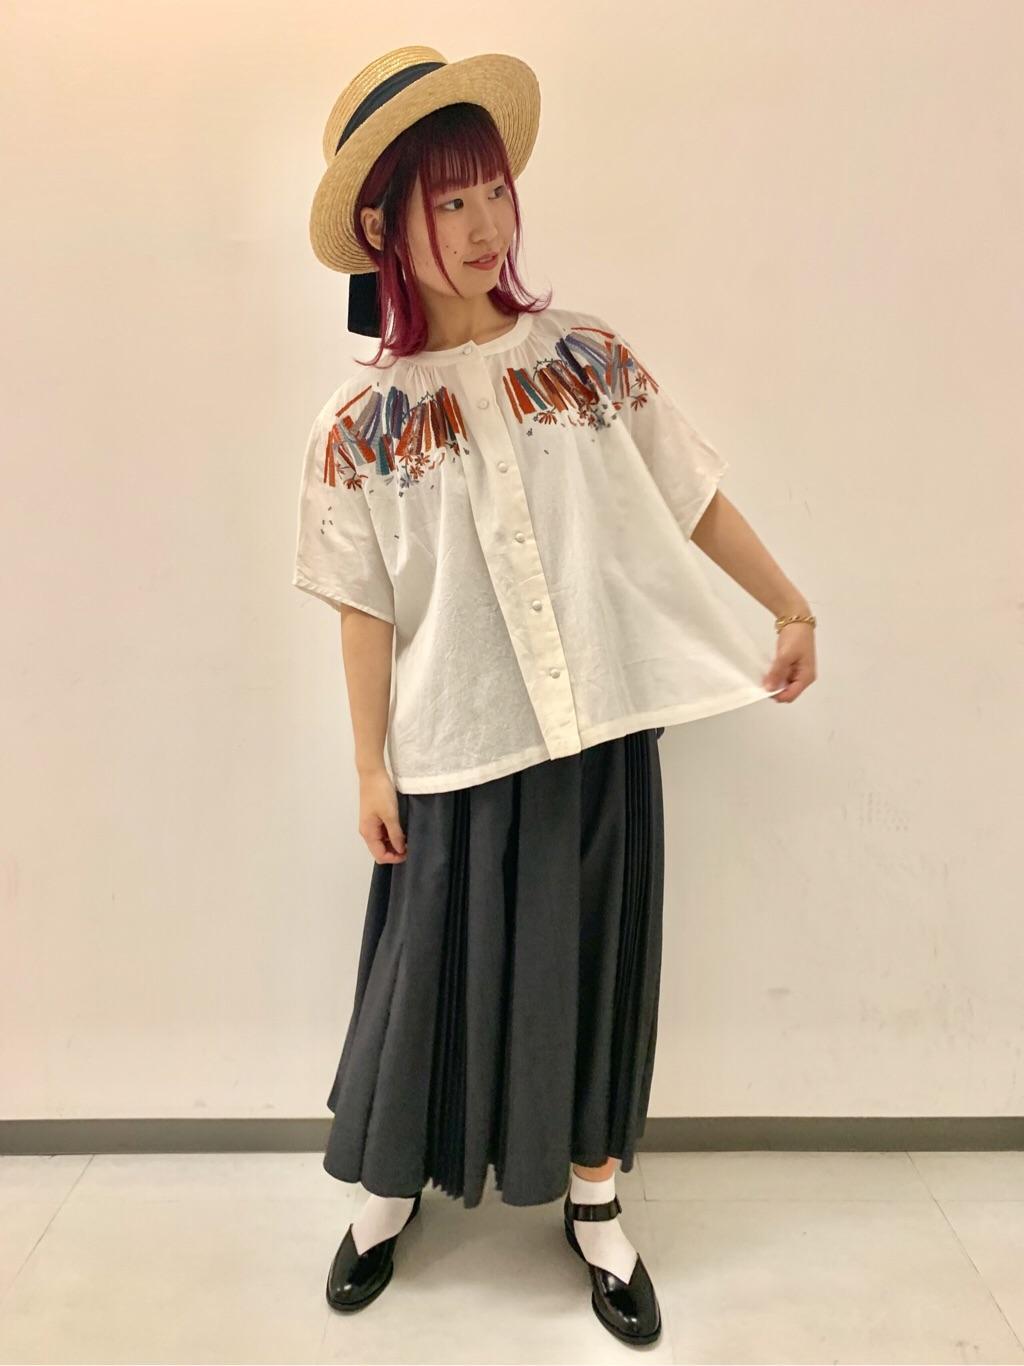 l'atelier du savon 広島パルコ 身長:157cm 2019.05.28